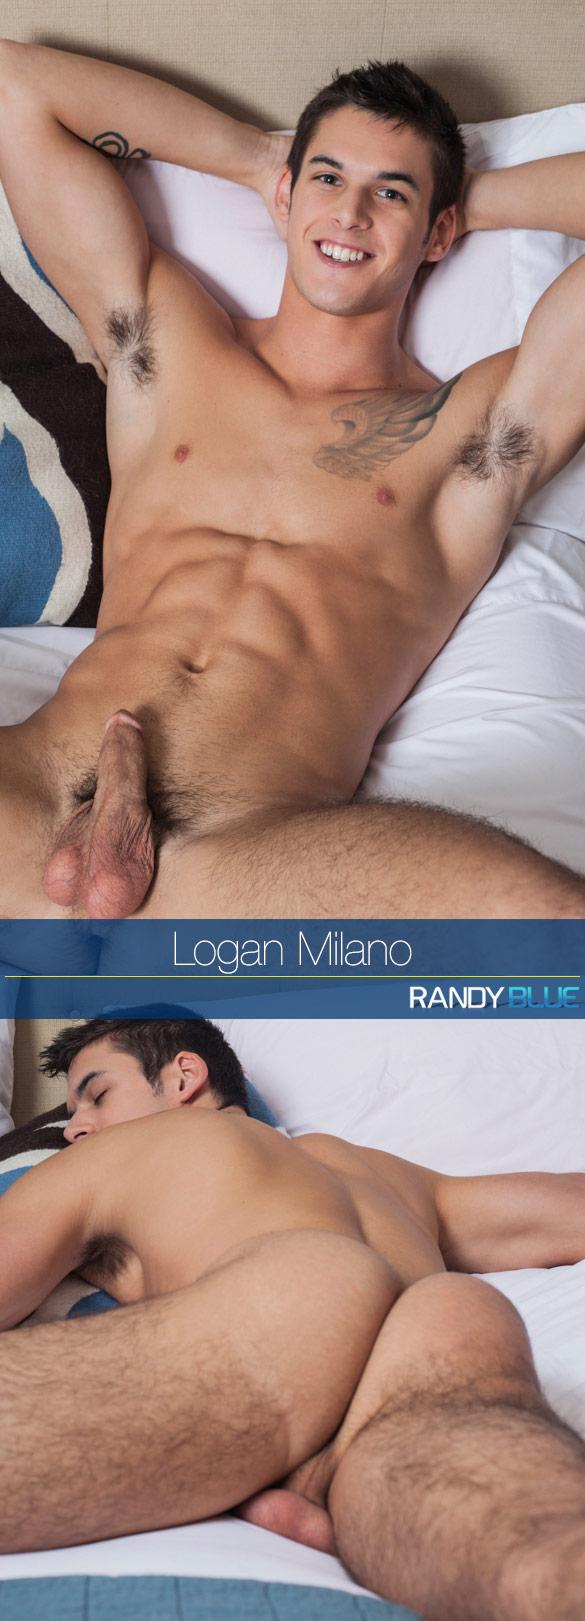 Randy Blue: Logan Milano rubs one out